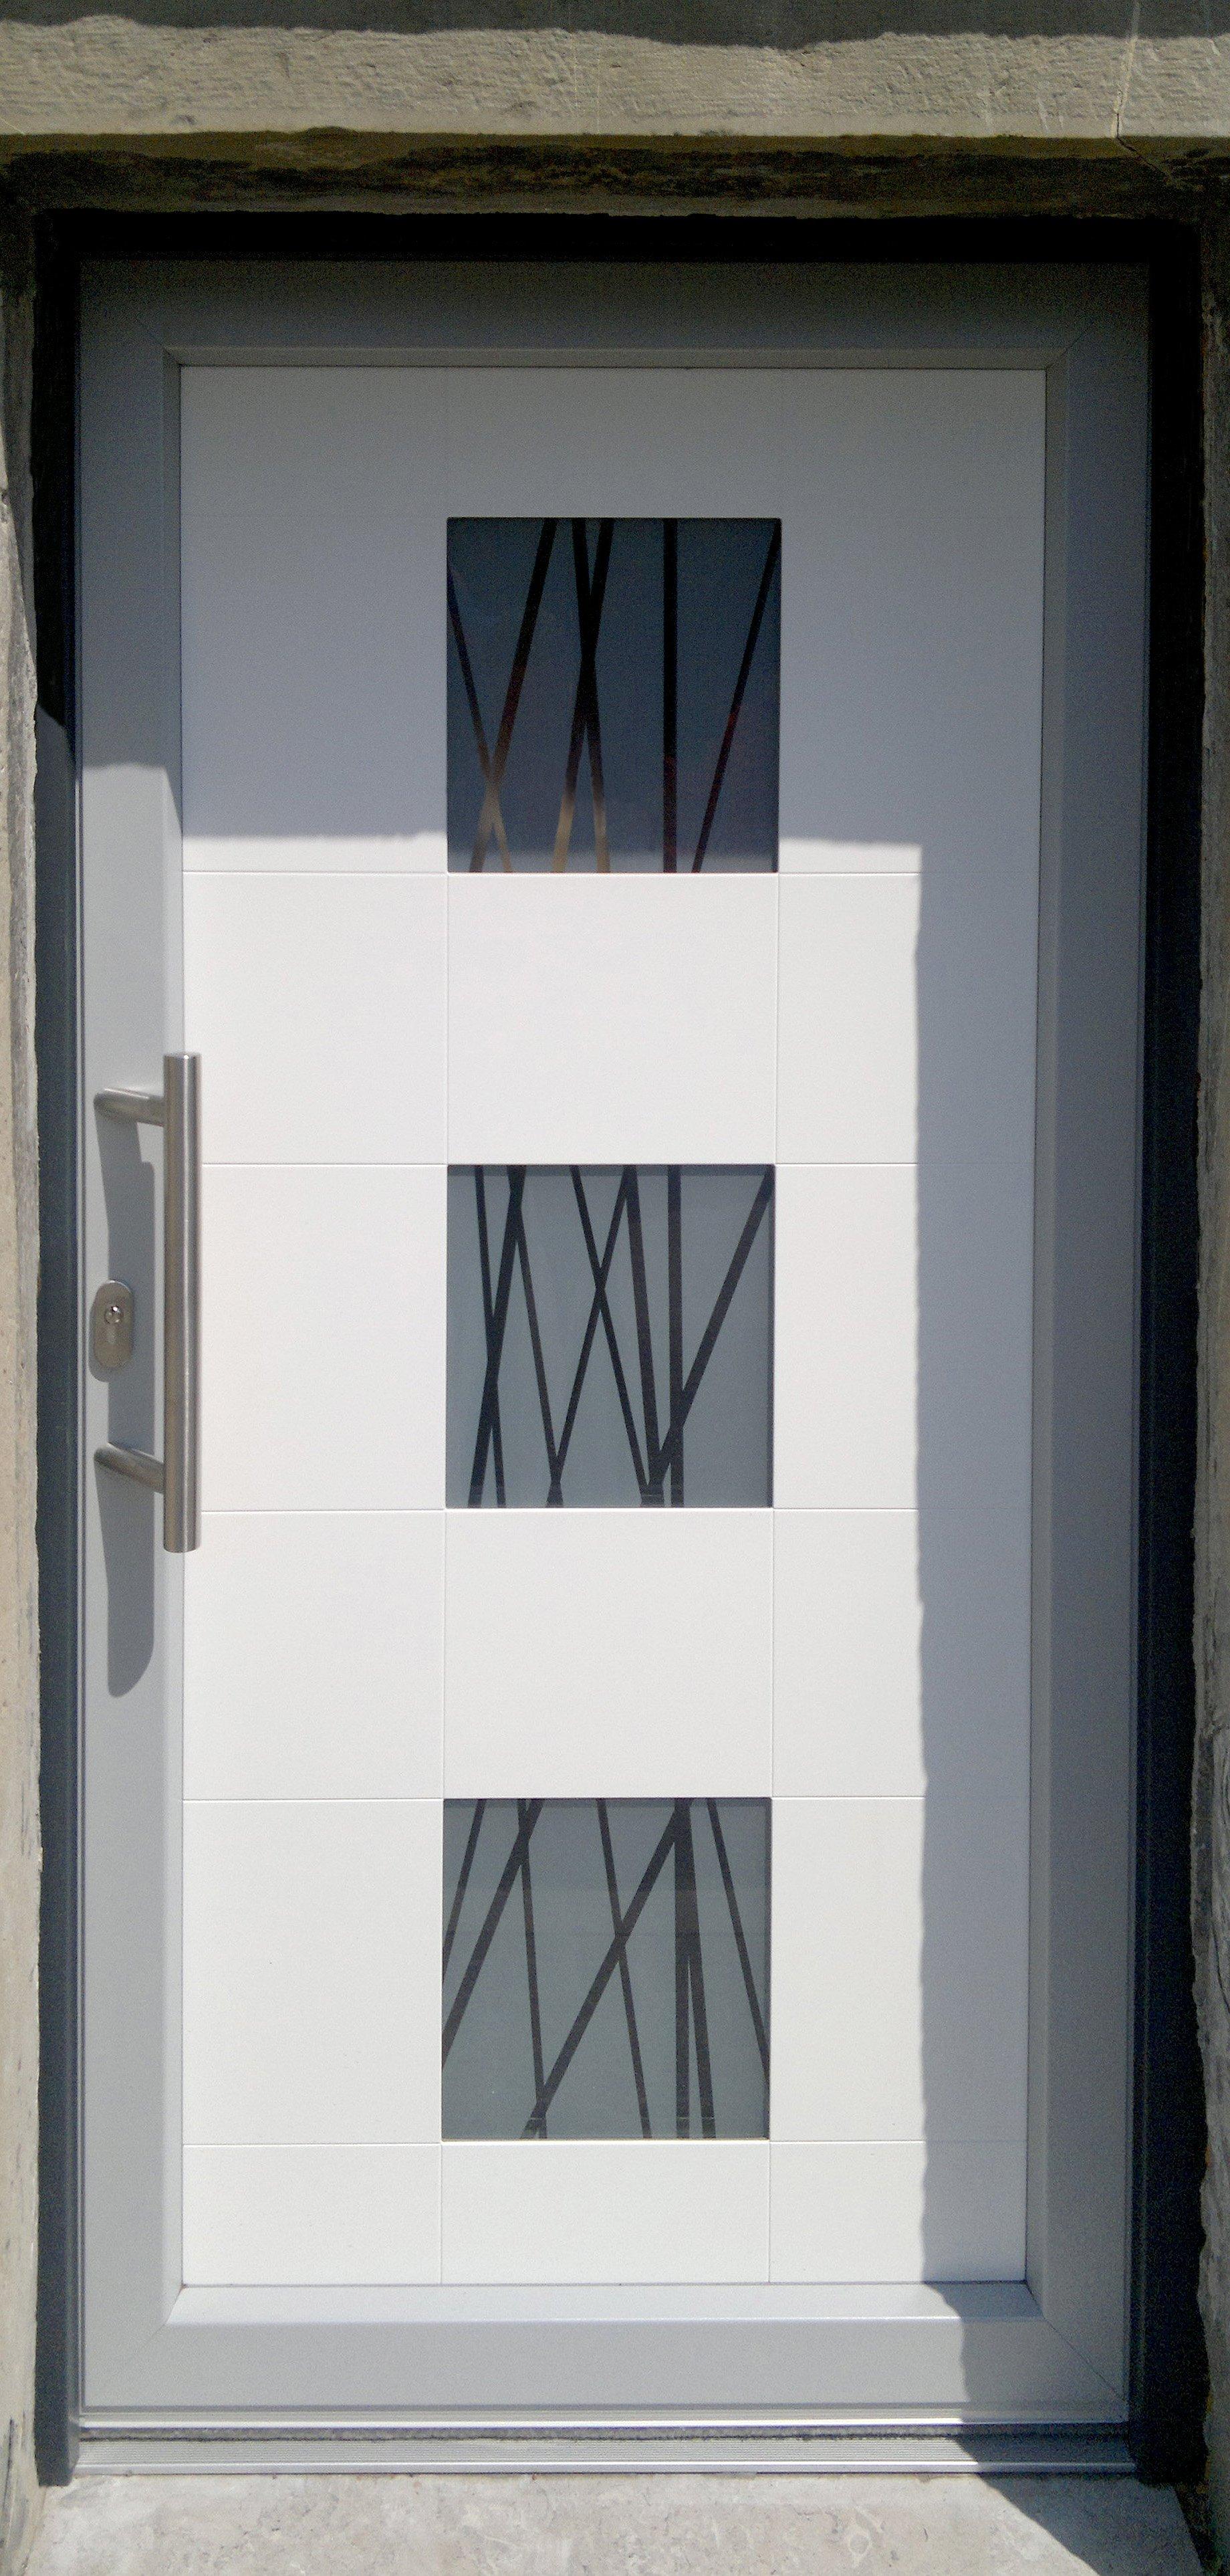 Awesome Portoncino Blindato Prezzo Photos - Home Design Ideas 2017 ...